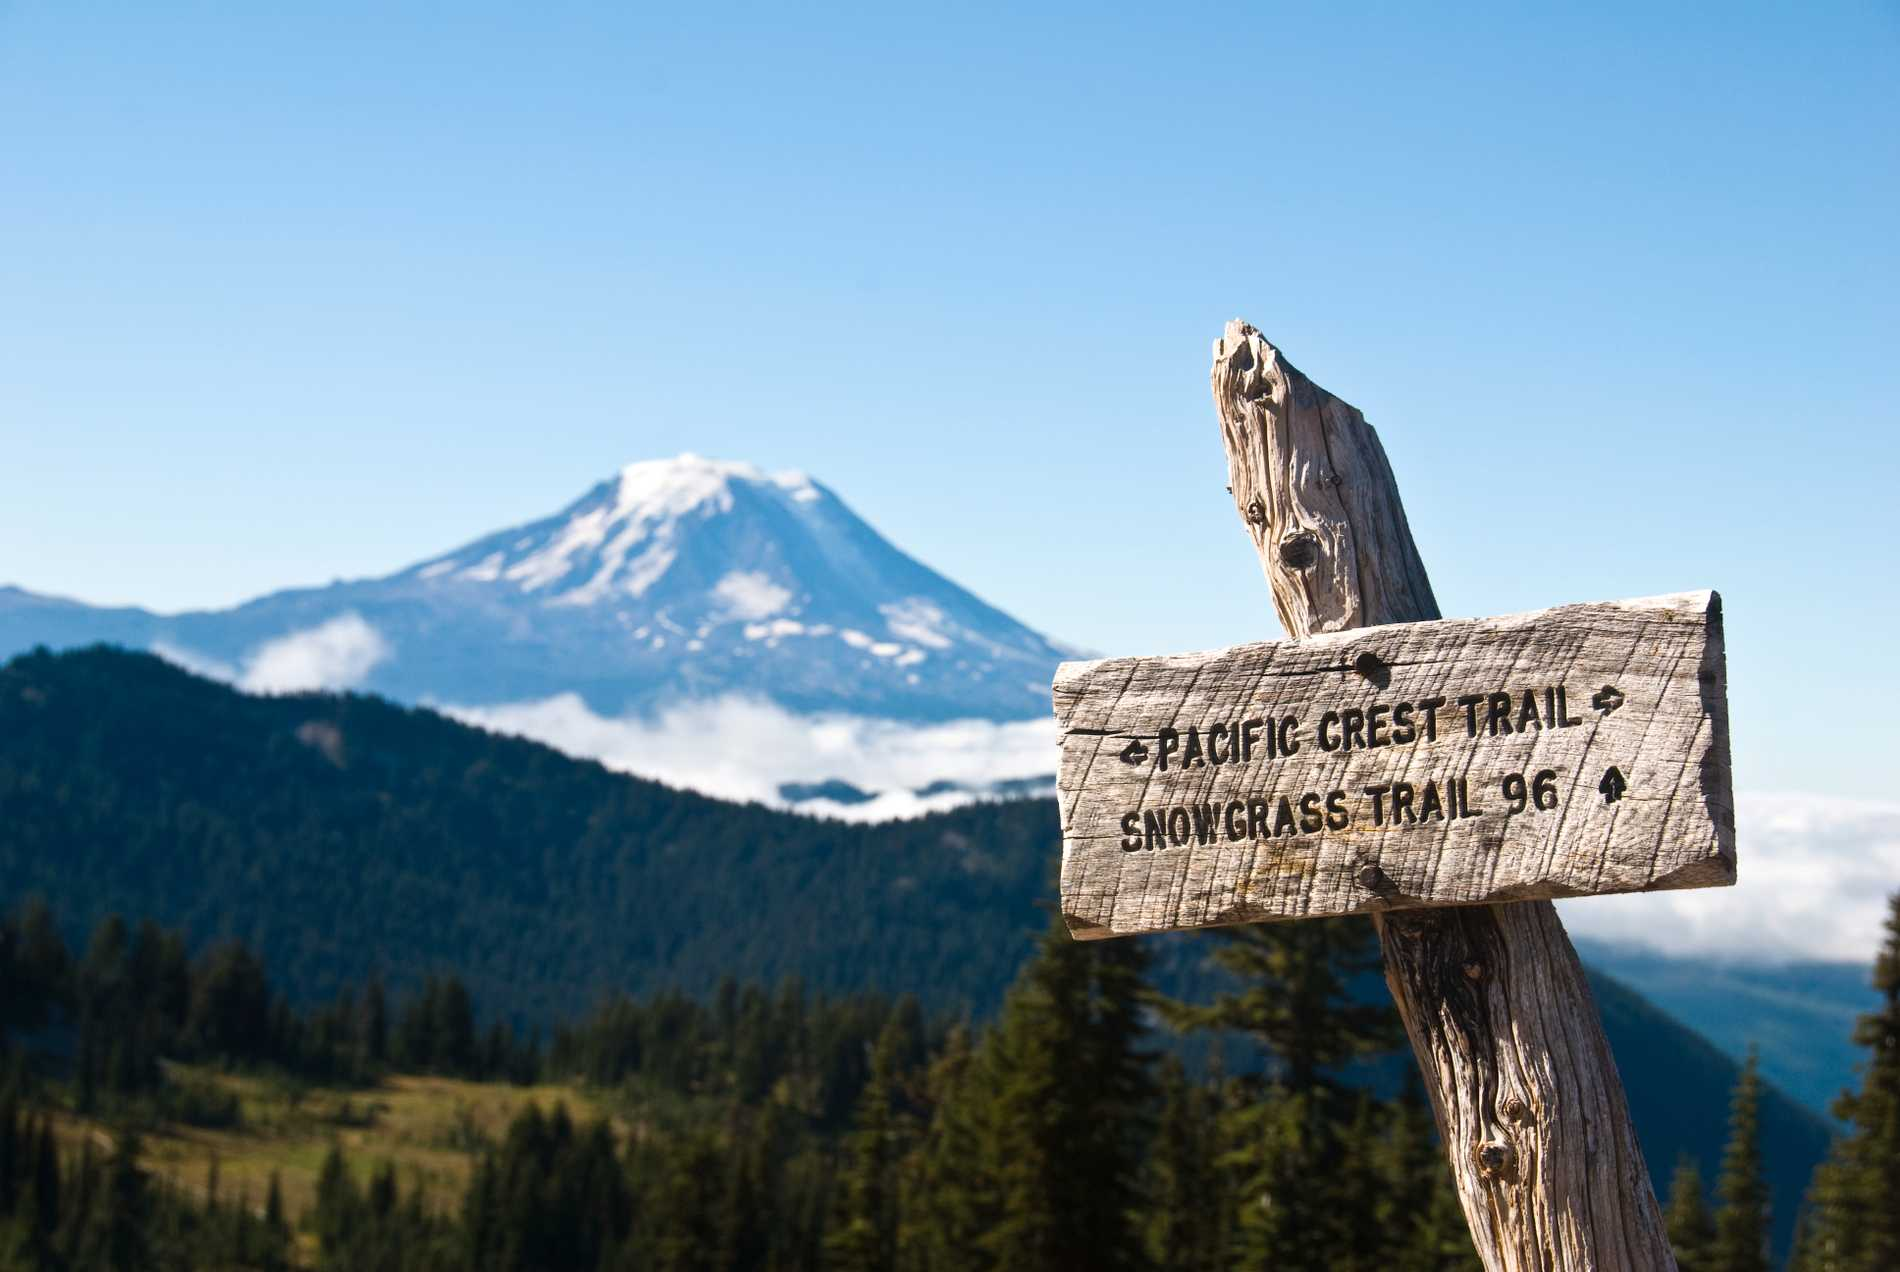 Cheryls Strayed vandrar The Pacific Crest Trail i filmen Wild.